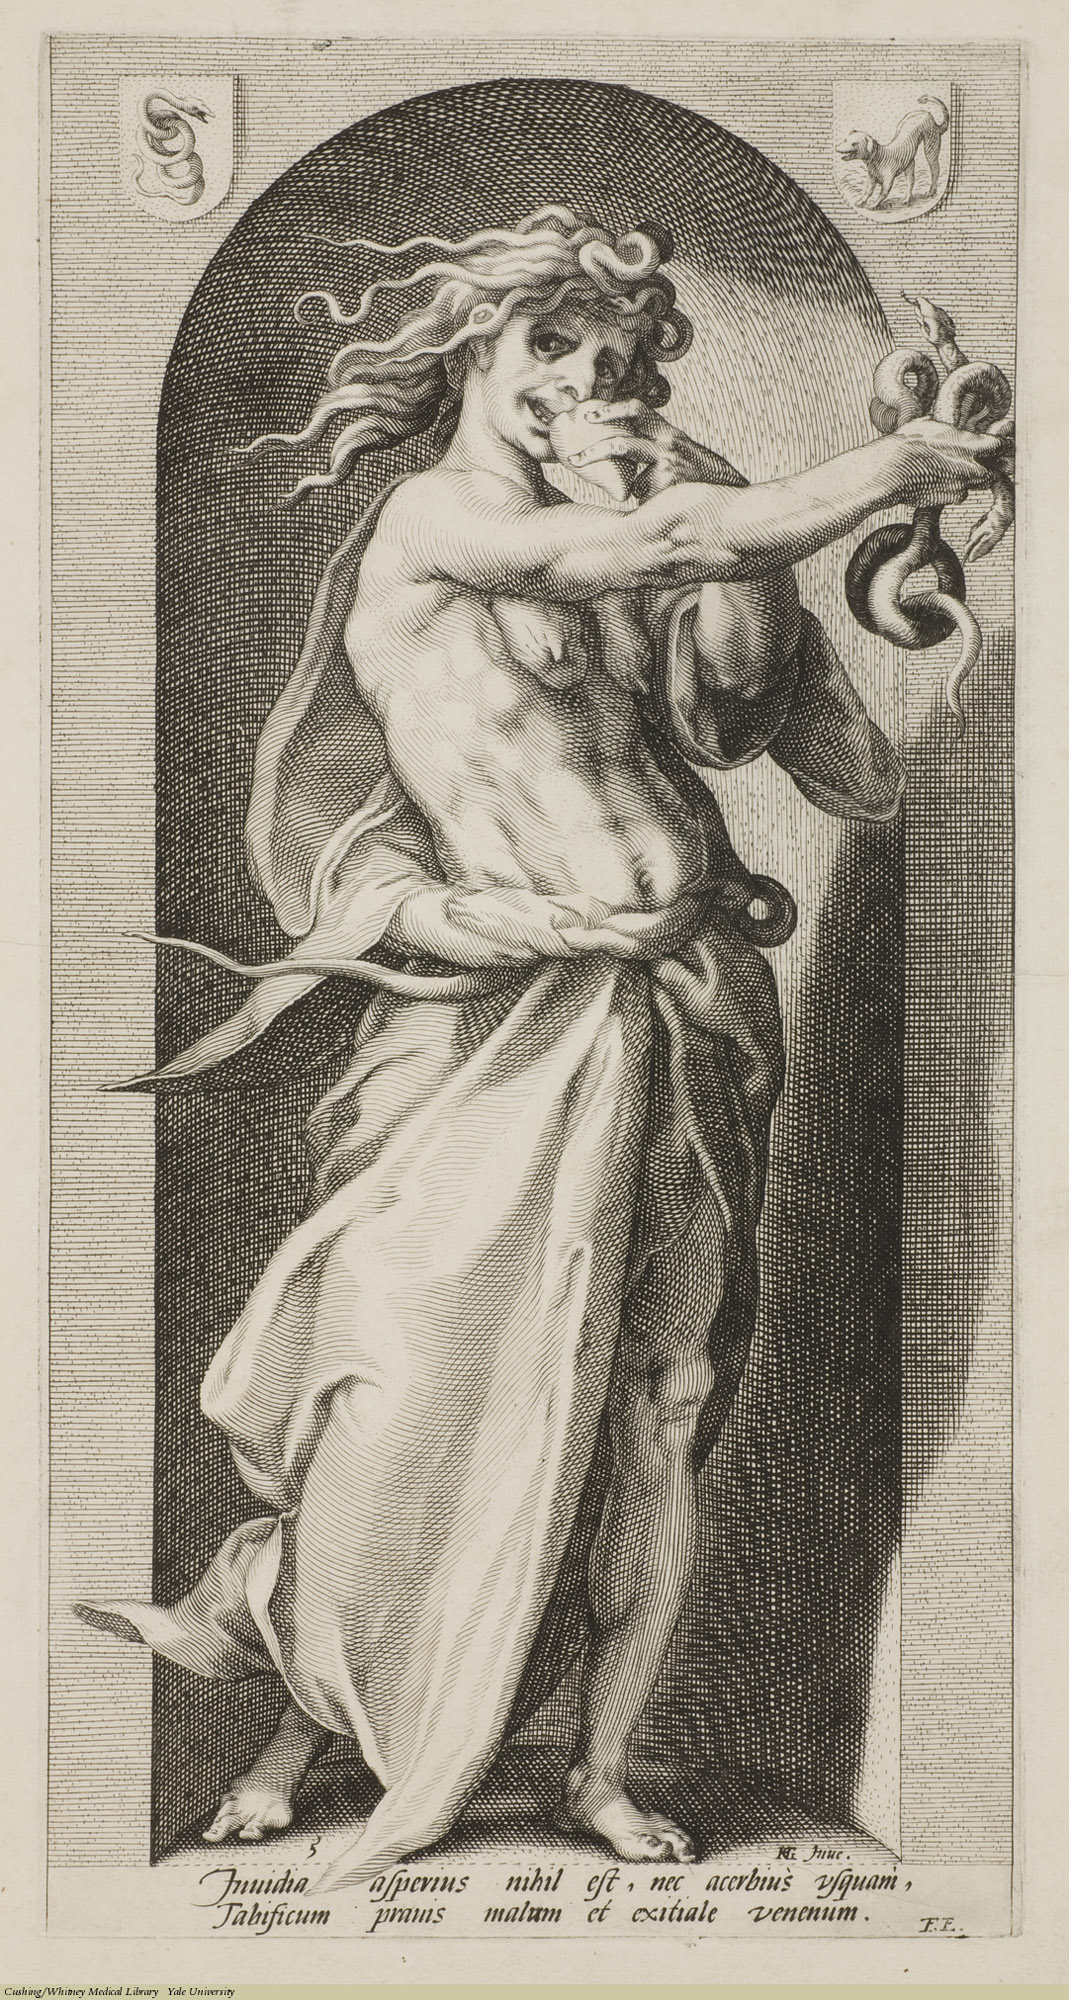 Envy. Hendrick Goltzius, Engraving, 1593. Subject: The Seven Vices, Envy, Psychology.